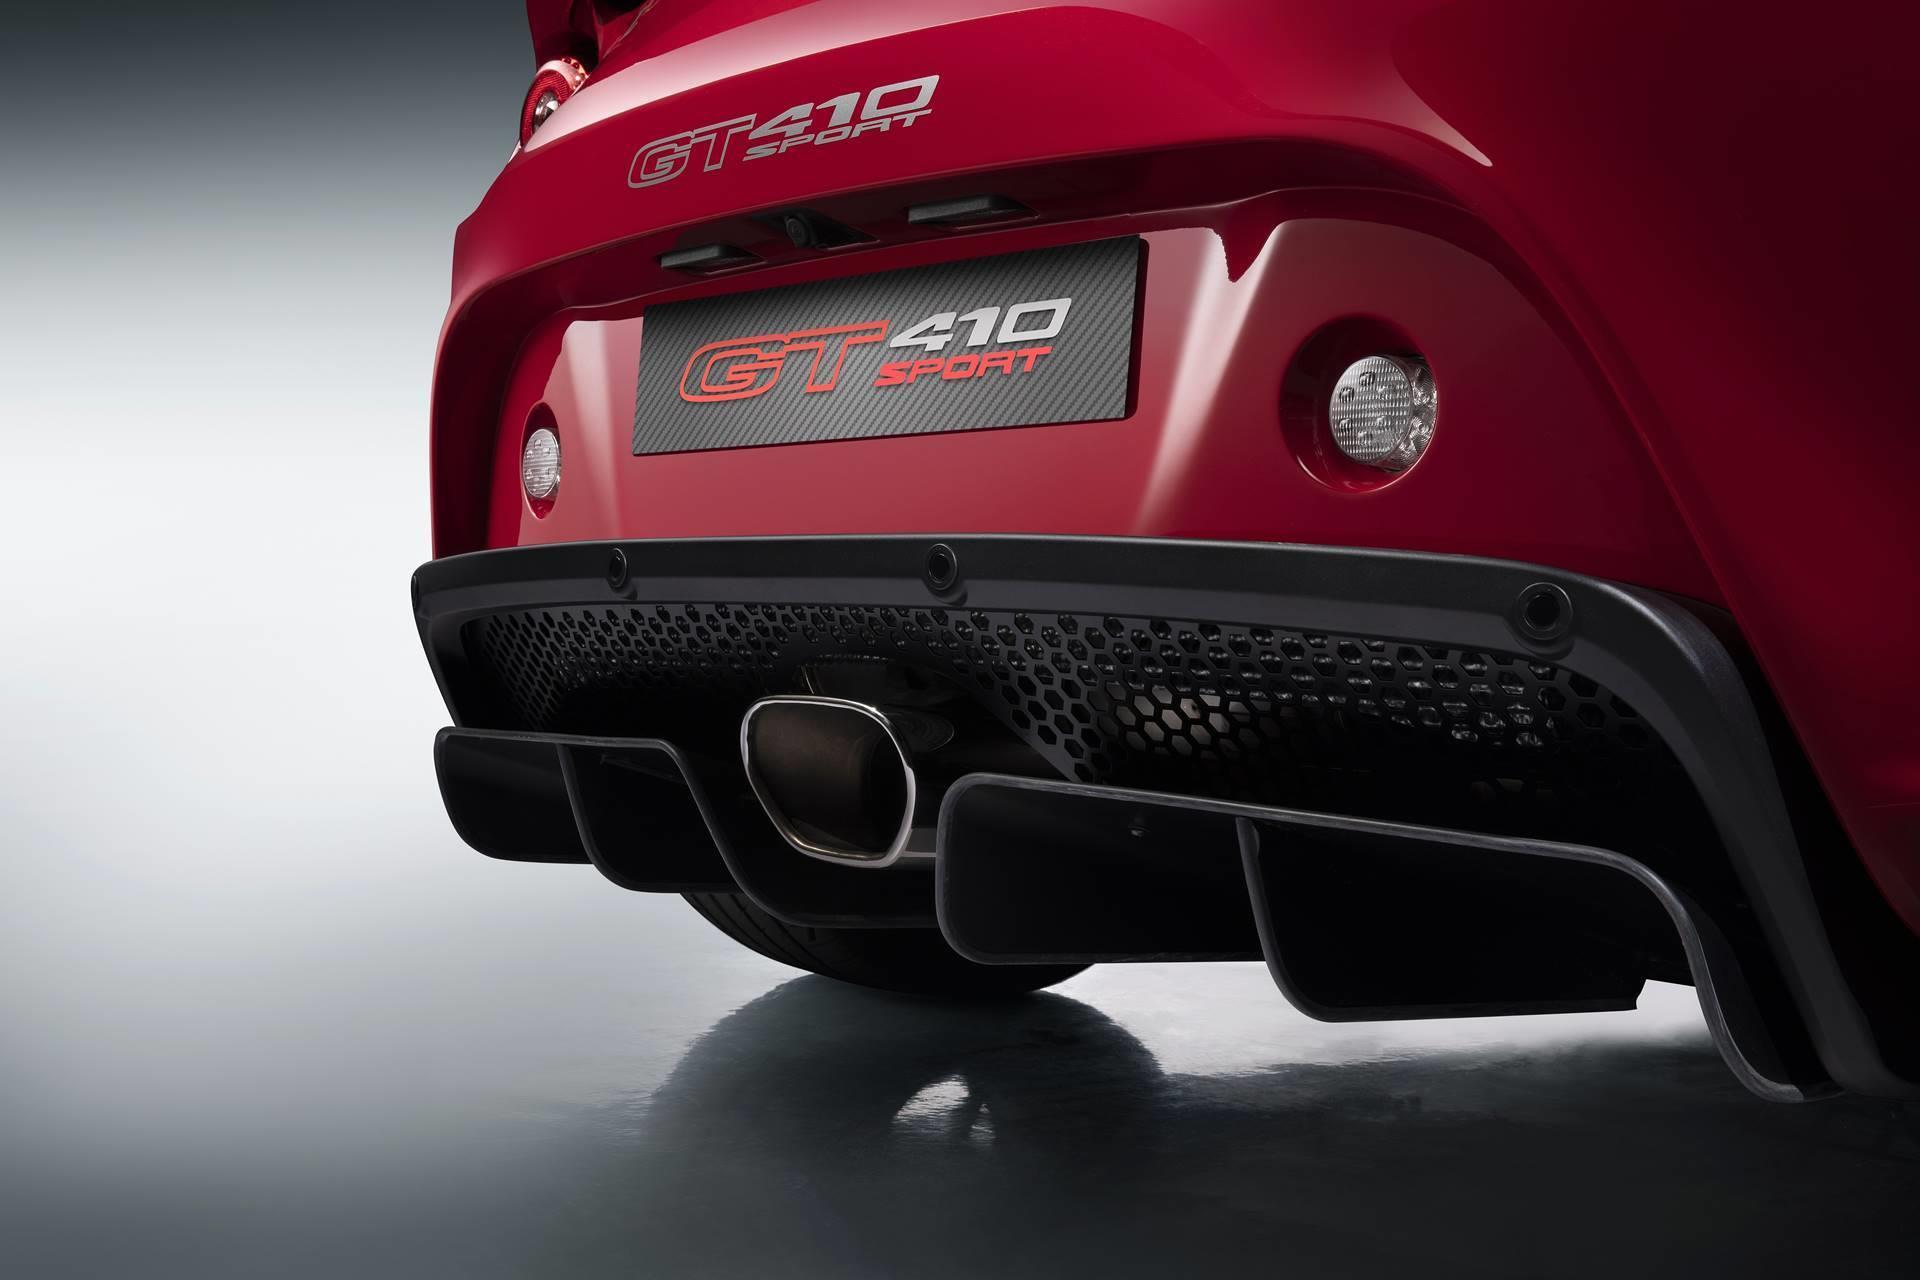 2019 Lotus Evora GT410 Sport